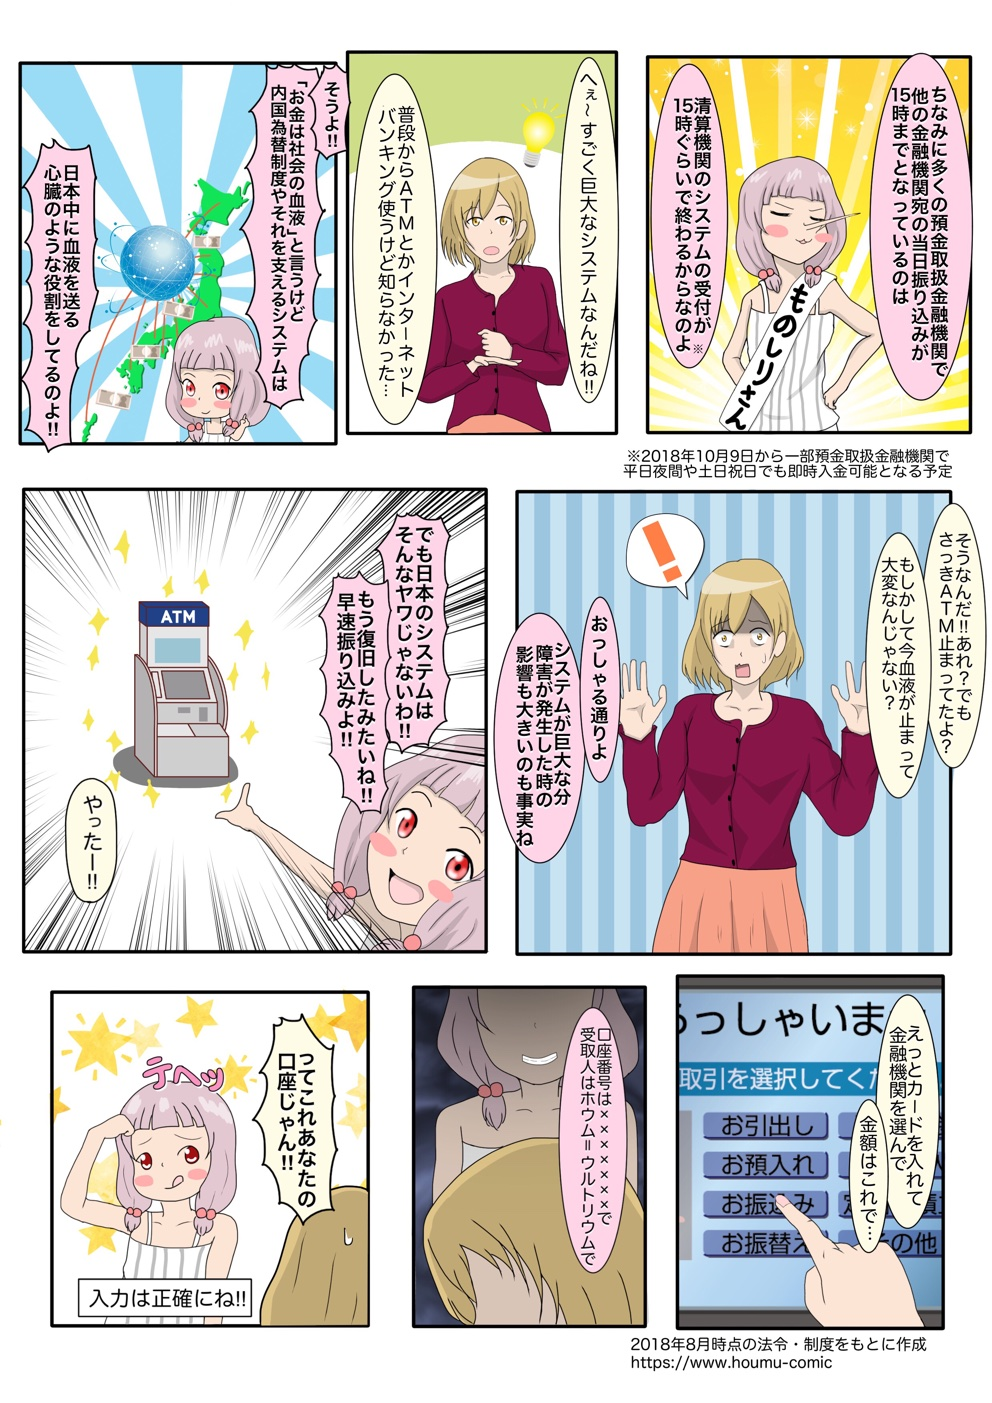 f:id:houmu_comic:20180814232342j:plain